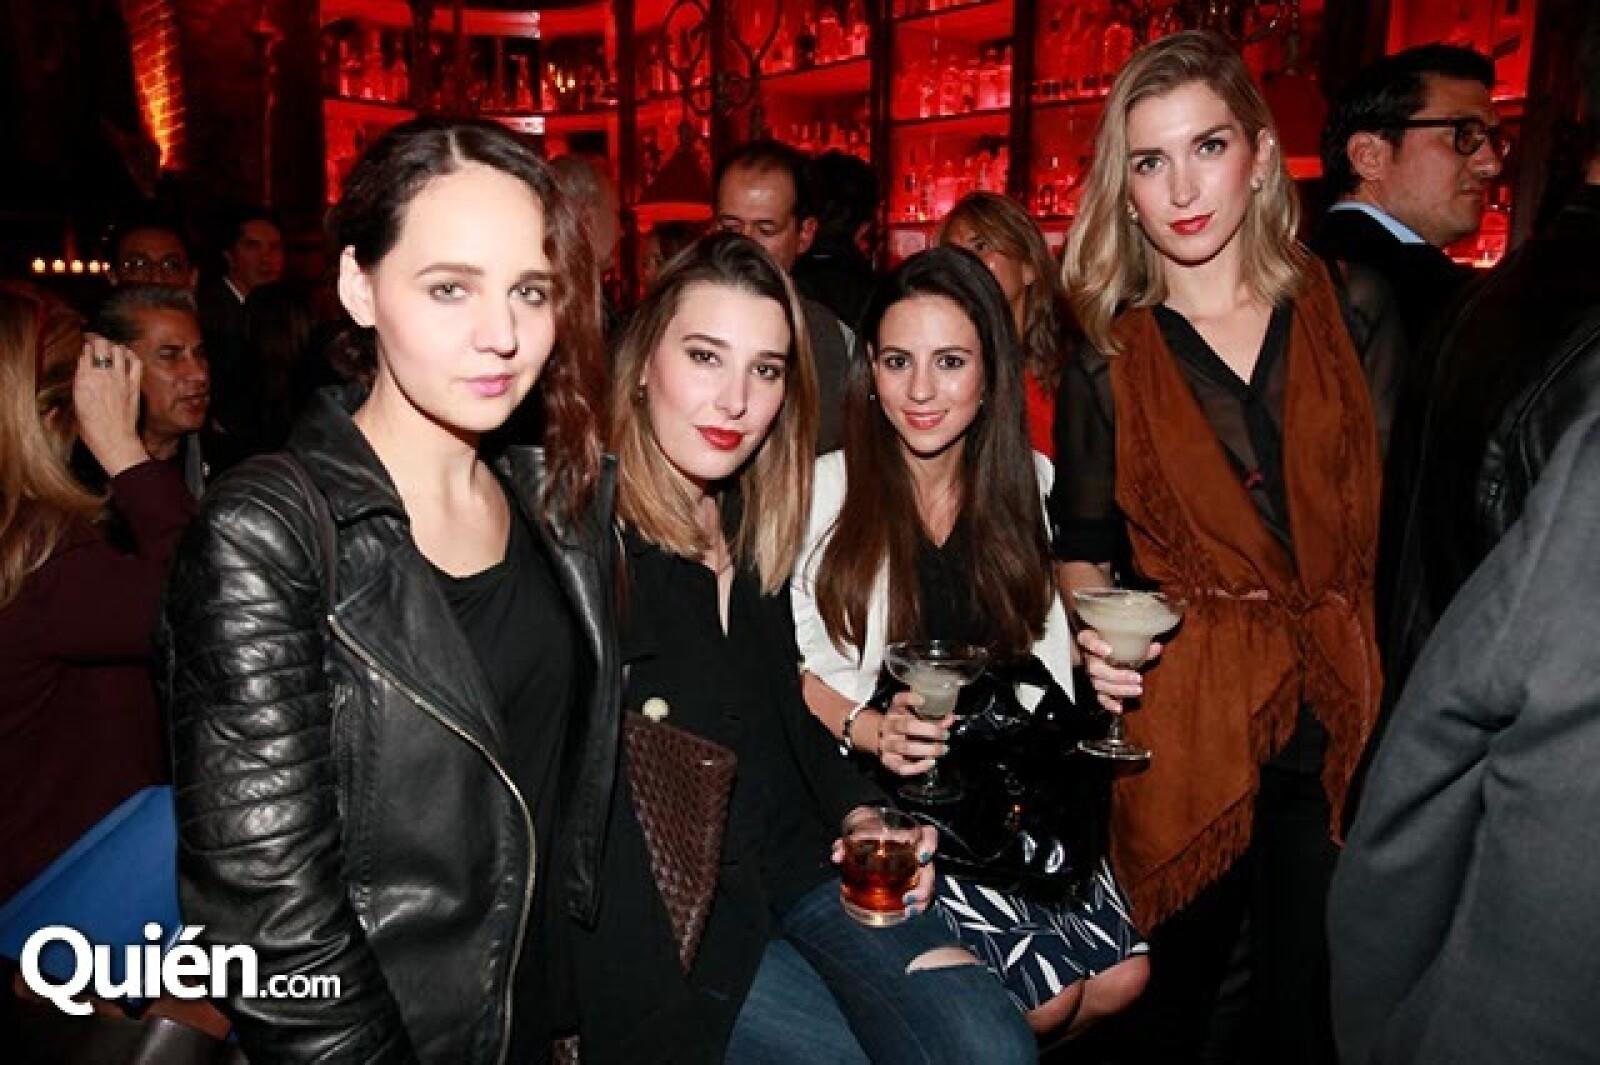 Ana Uribe,Marioly Torres,Daniela Díaz y Paola Sierra